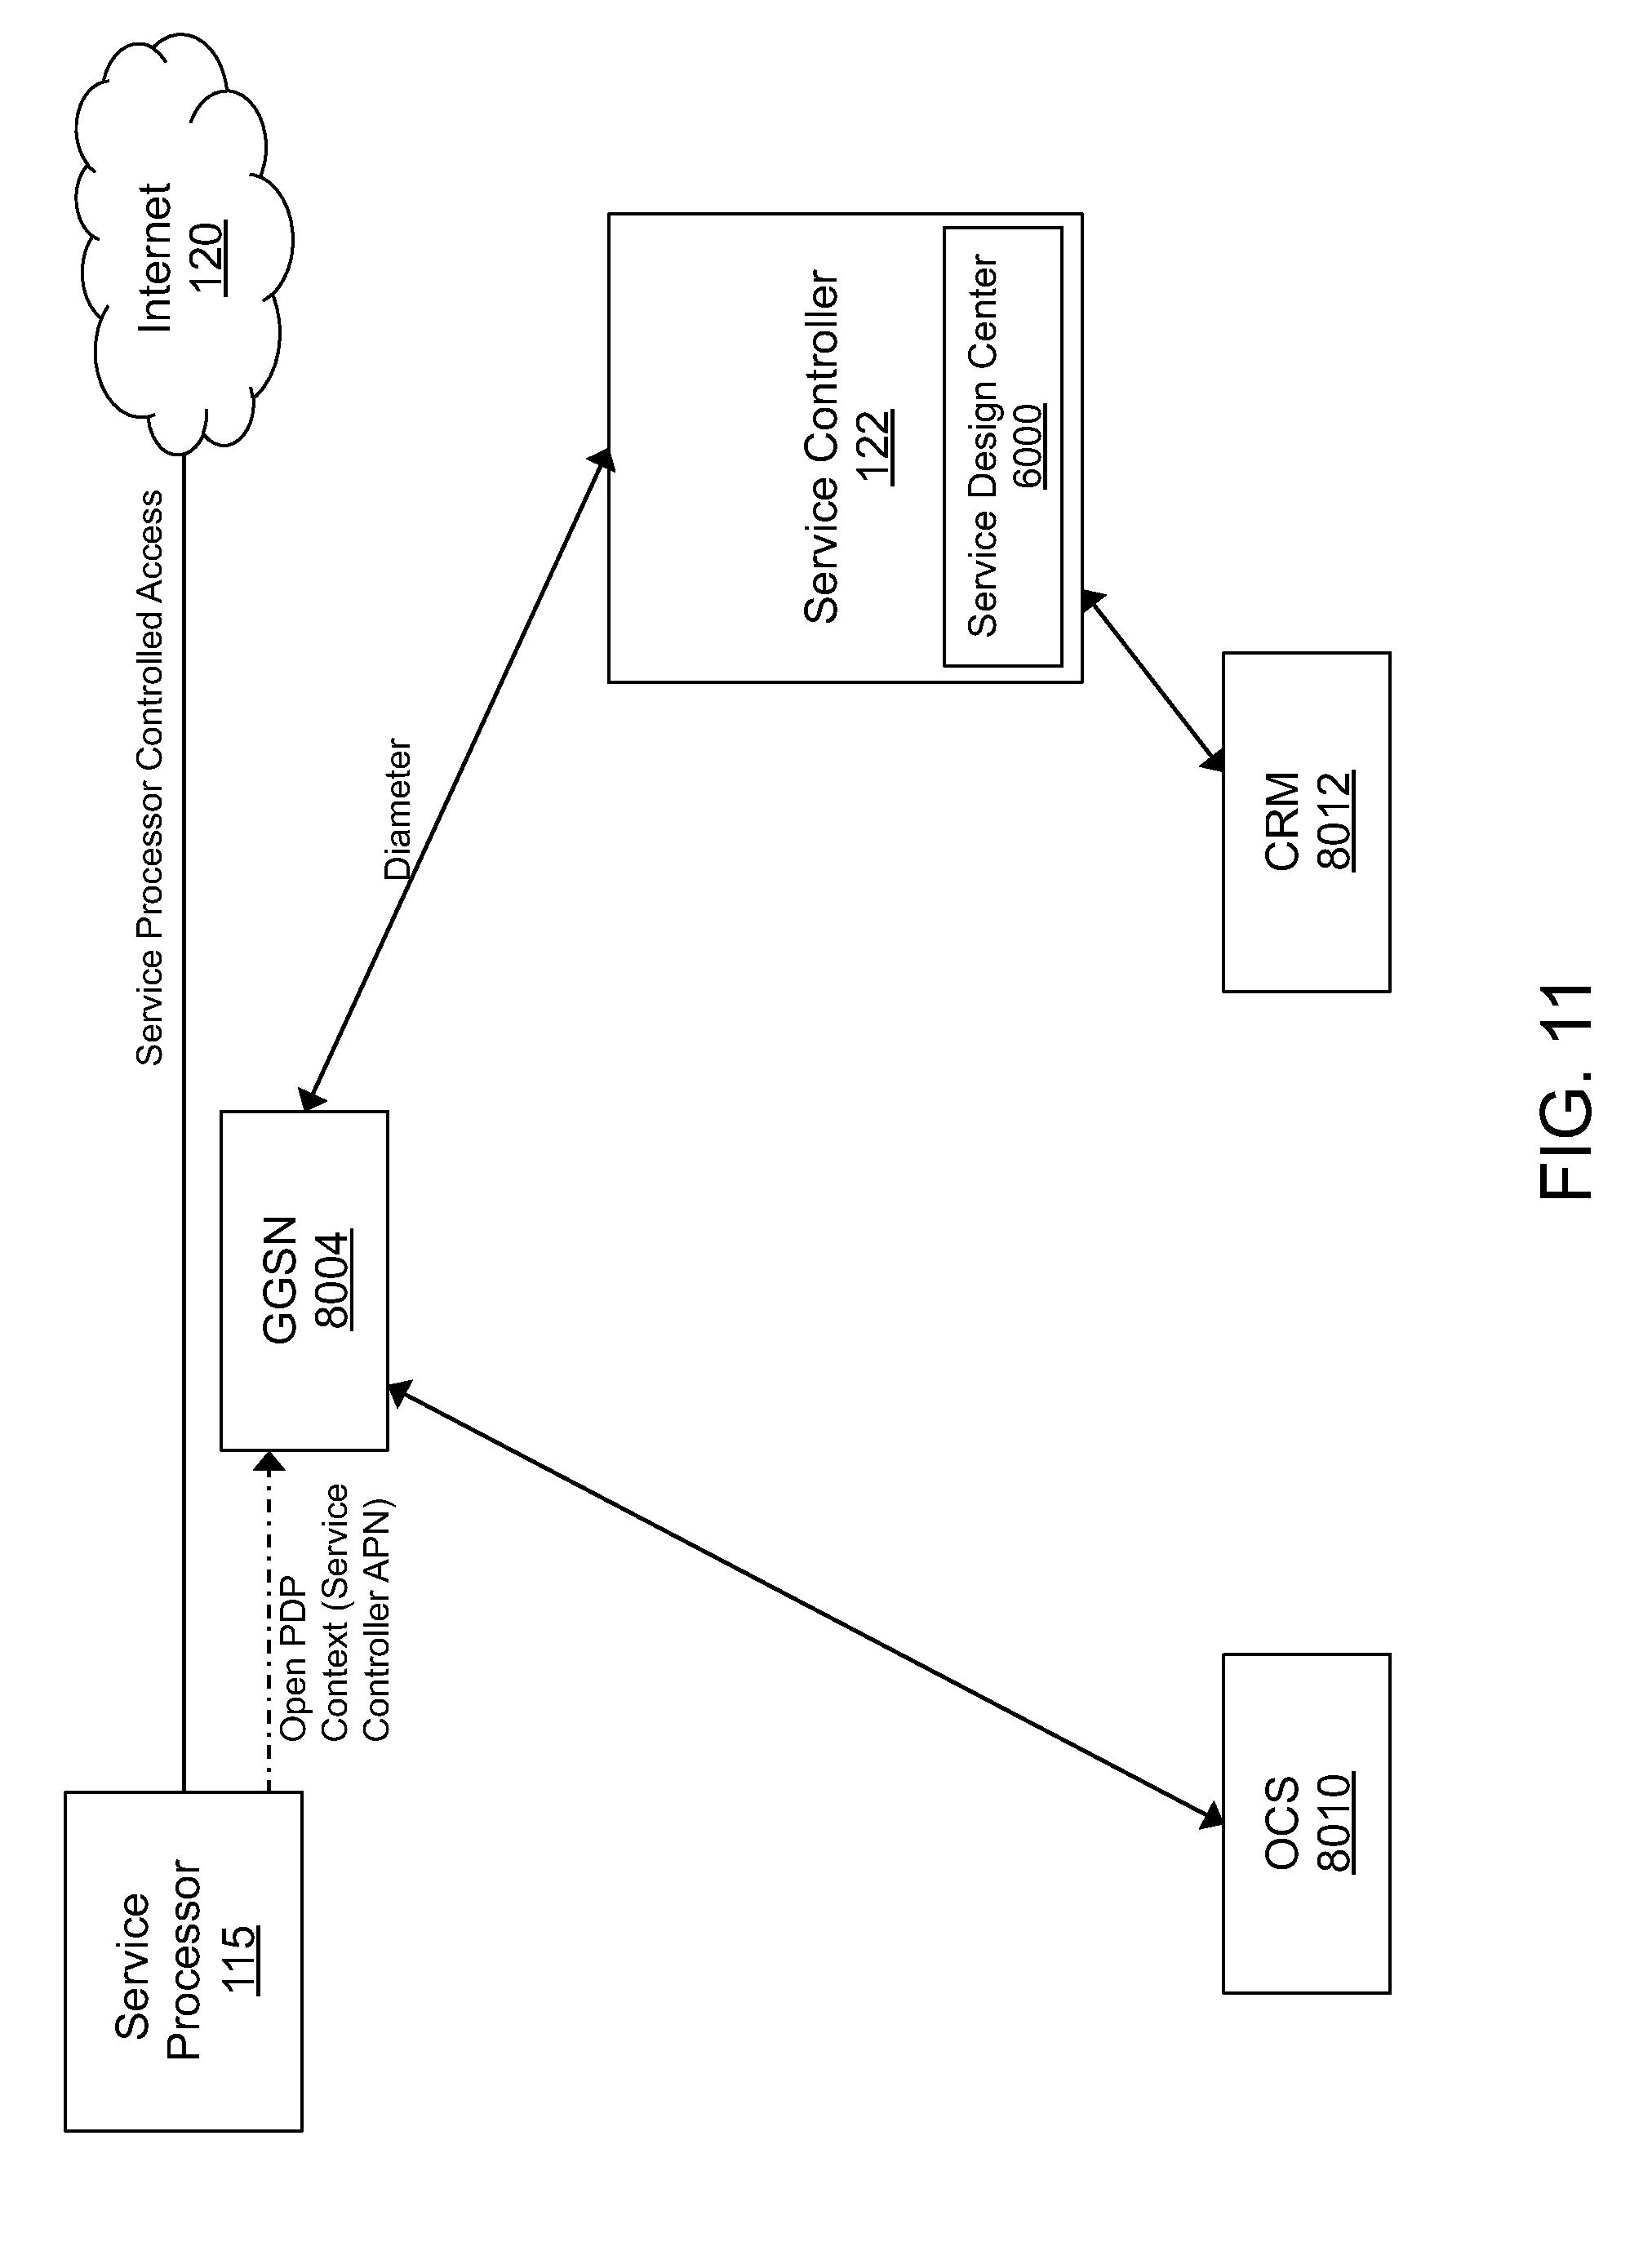 Patent US 10,057,775 B2